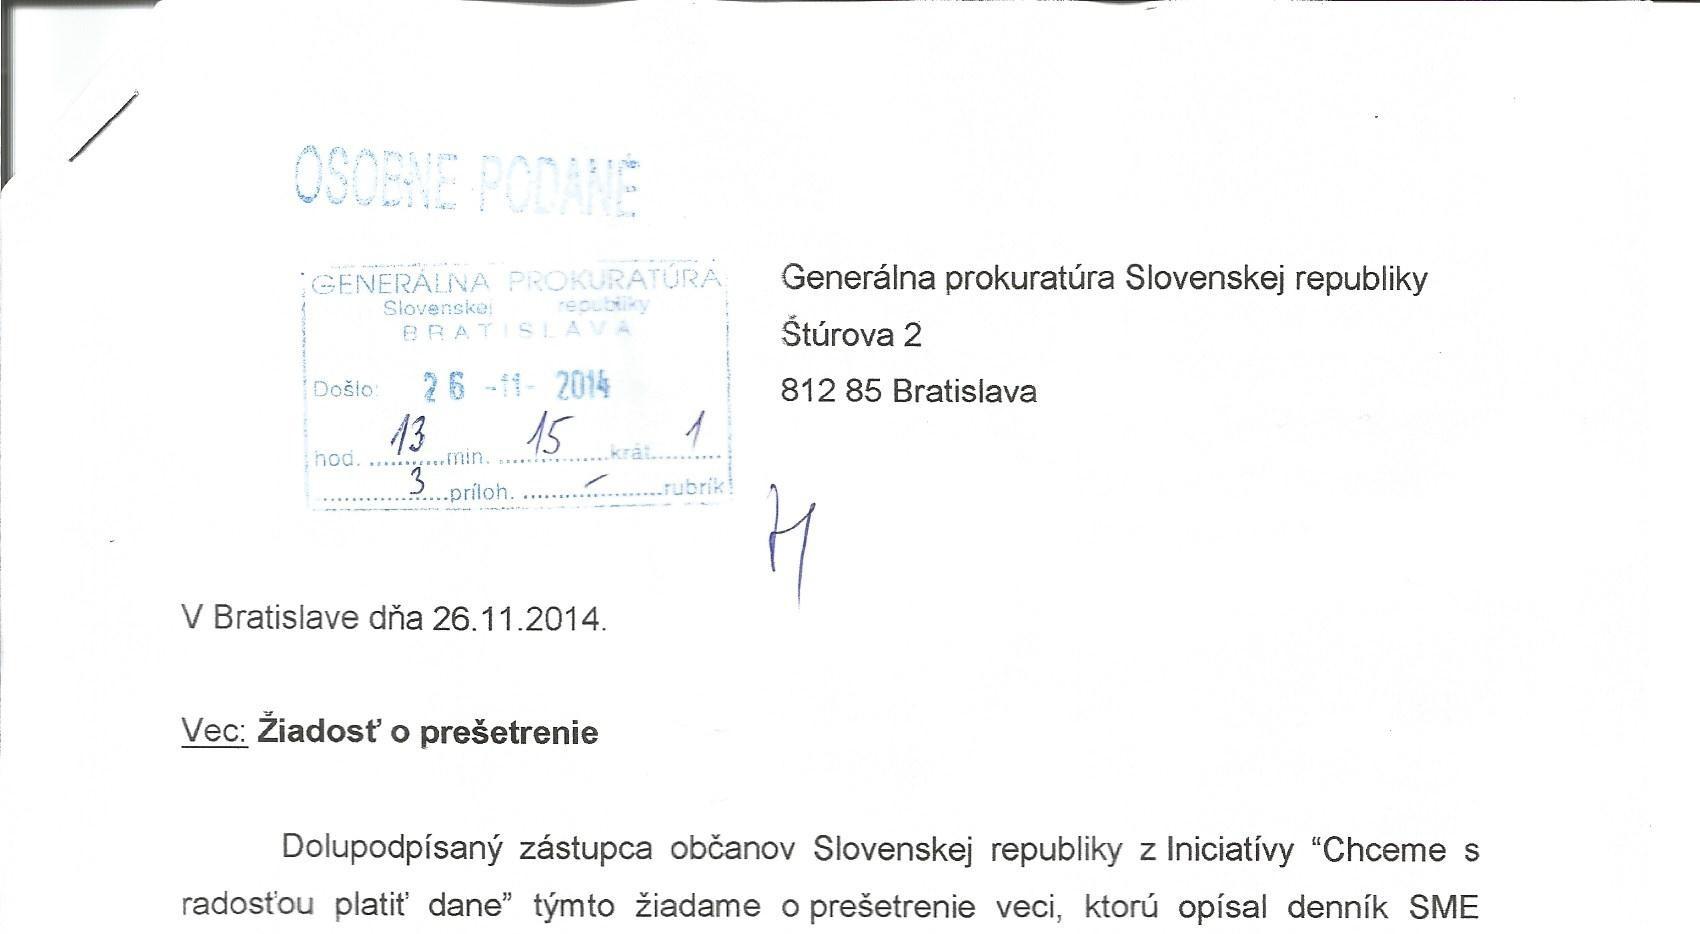 Pociatkove Palivove Karty Odpoved Kriminalnej Policie Dennik N